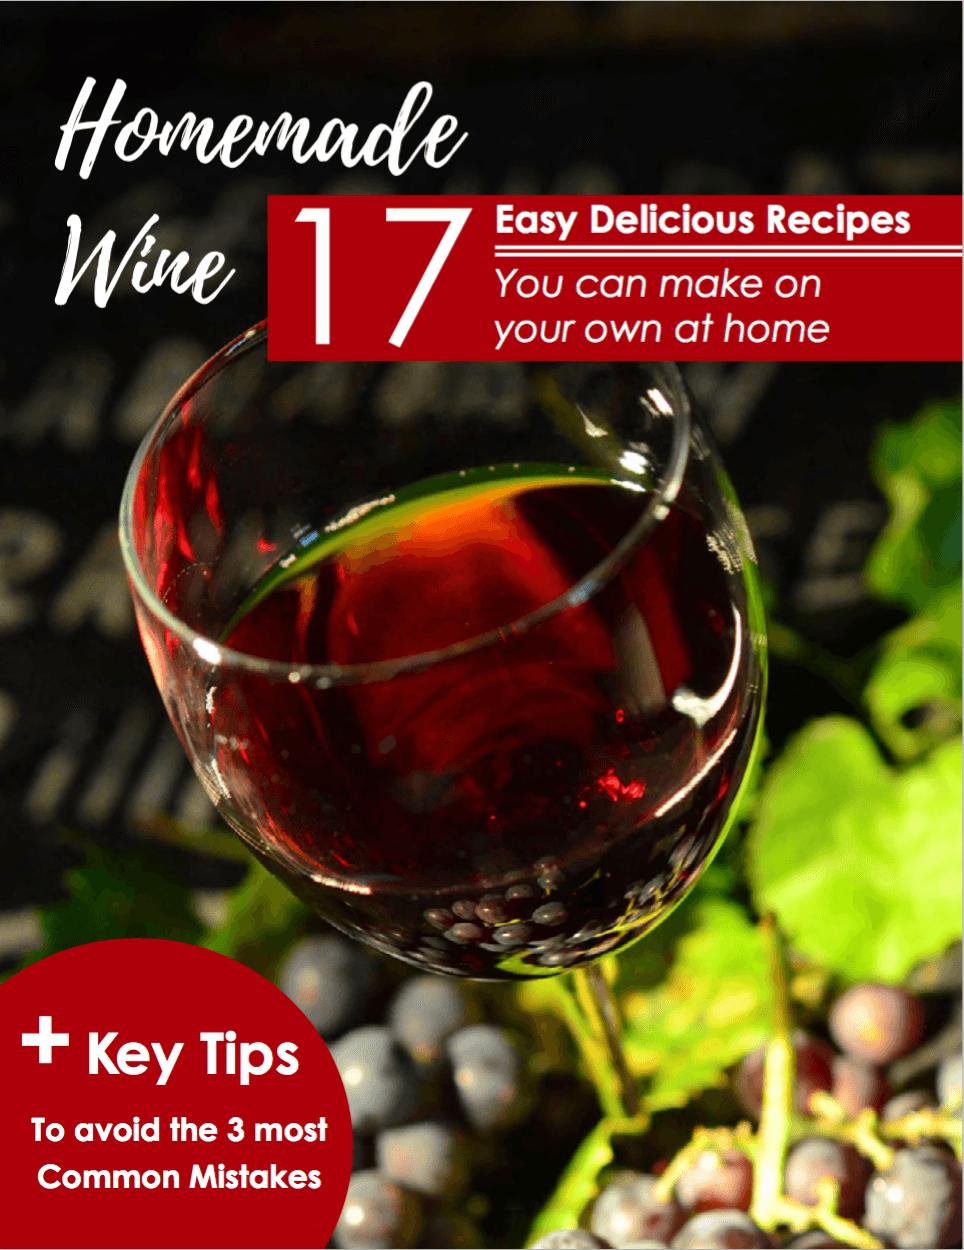 Homemade Wine eBook Cover